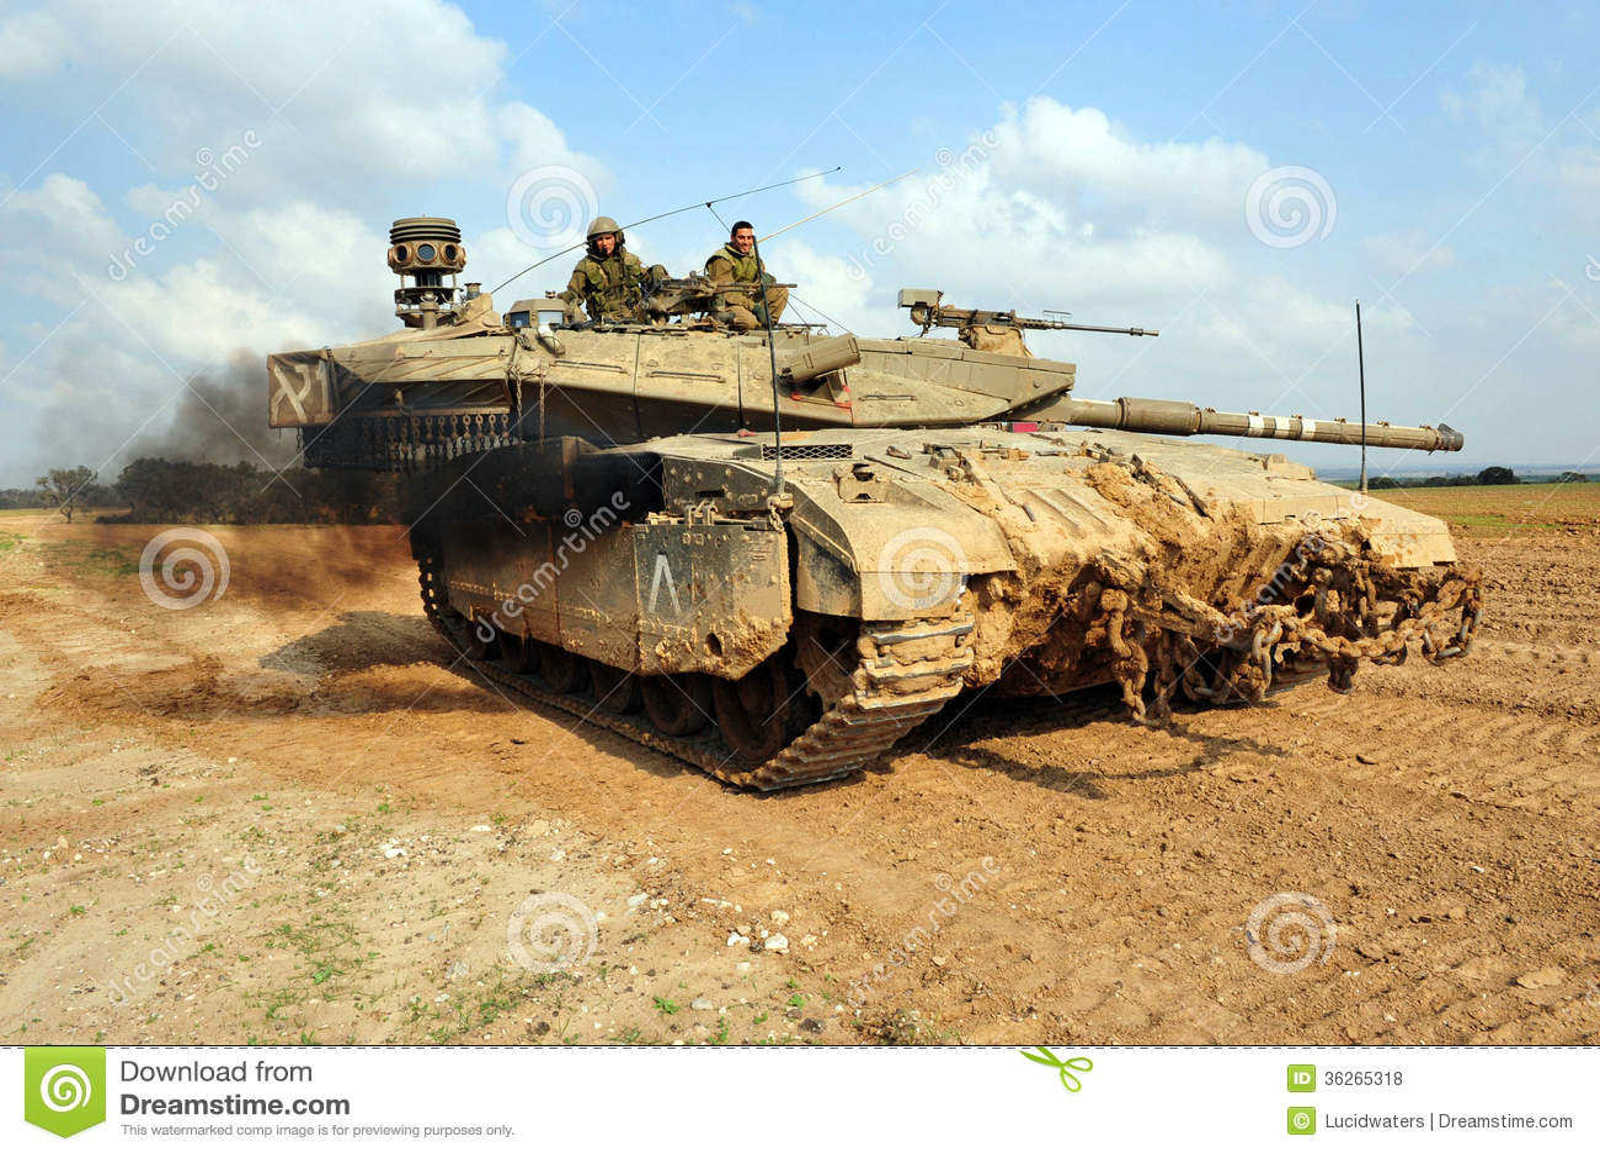 Military Camouflage Wallpaper Hd Israel Army Merkava Tank Editorial Stock Photo Image